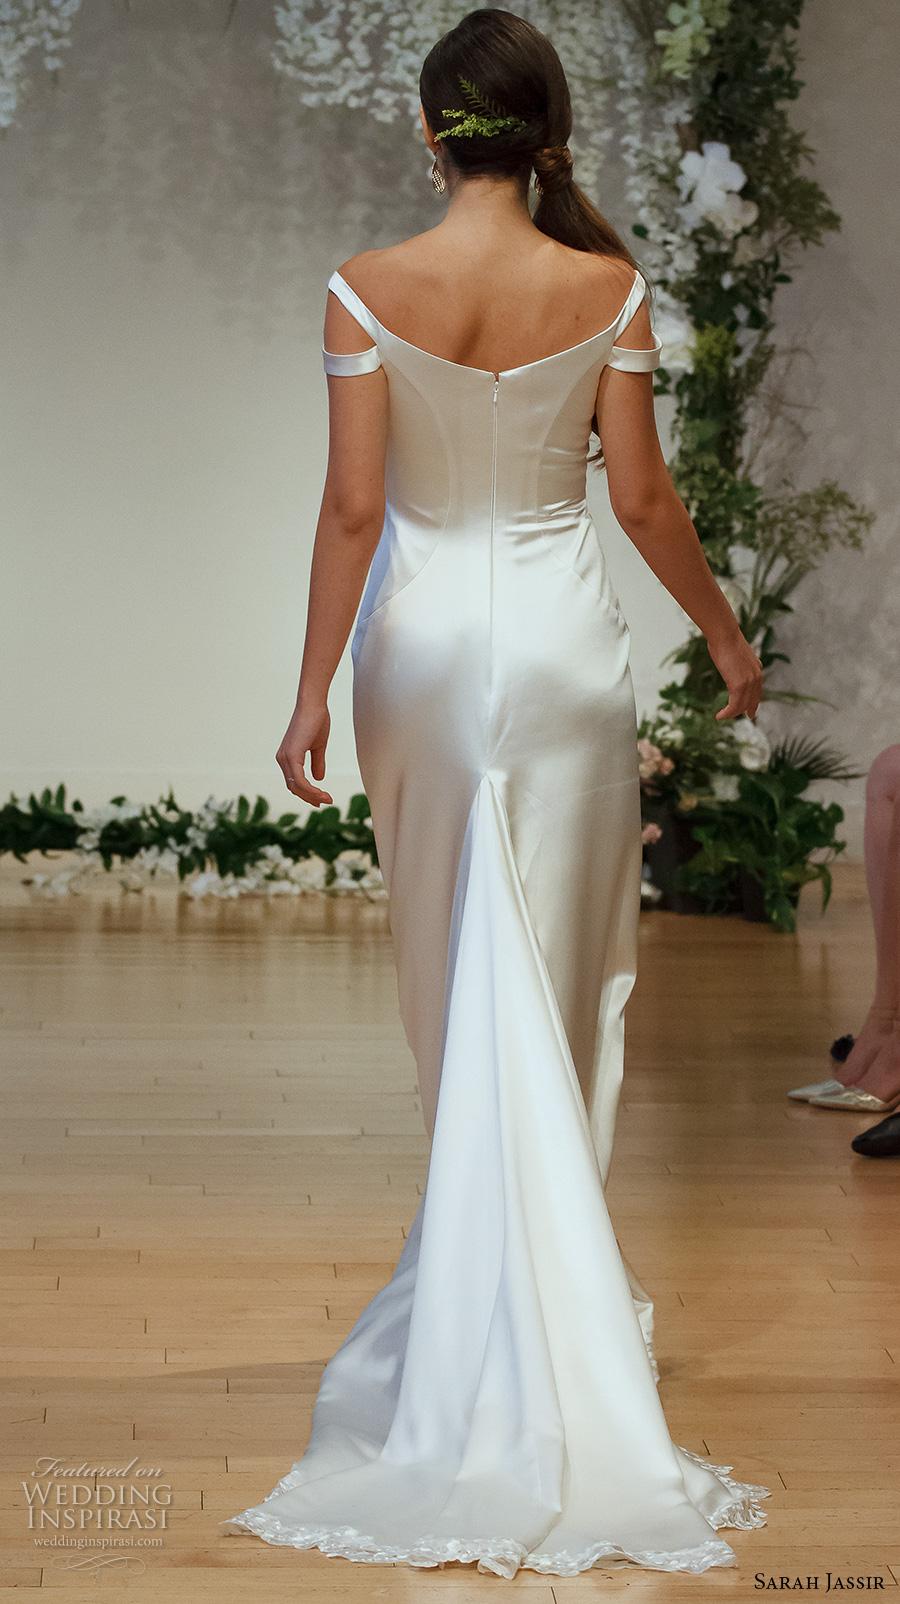 sarah jassir 2017 bridal off the shoulder scoop neck simple clean satin elegant sheath wedding dress sweep train (13) bv